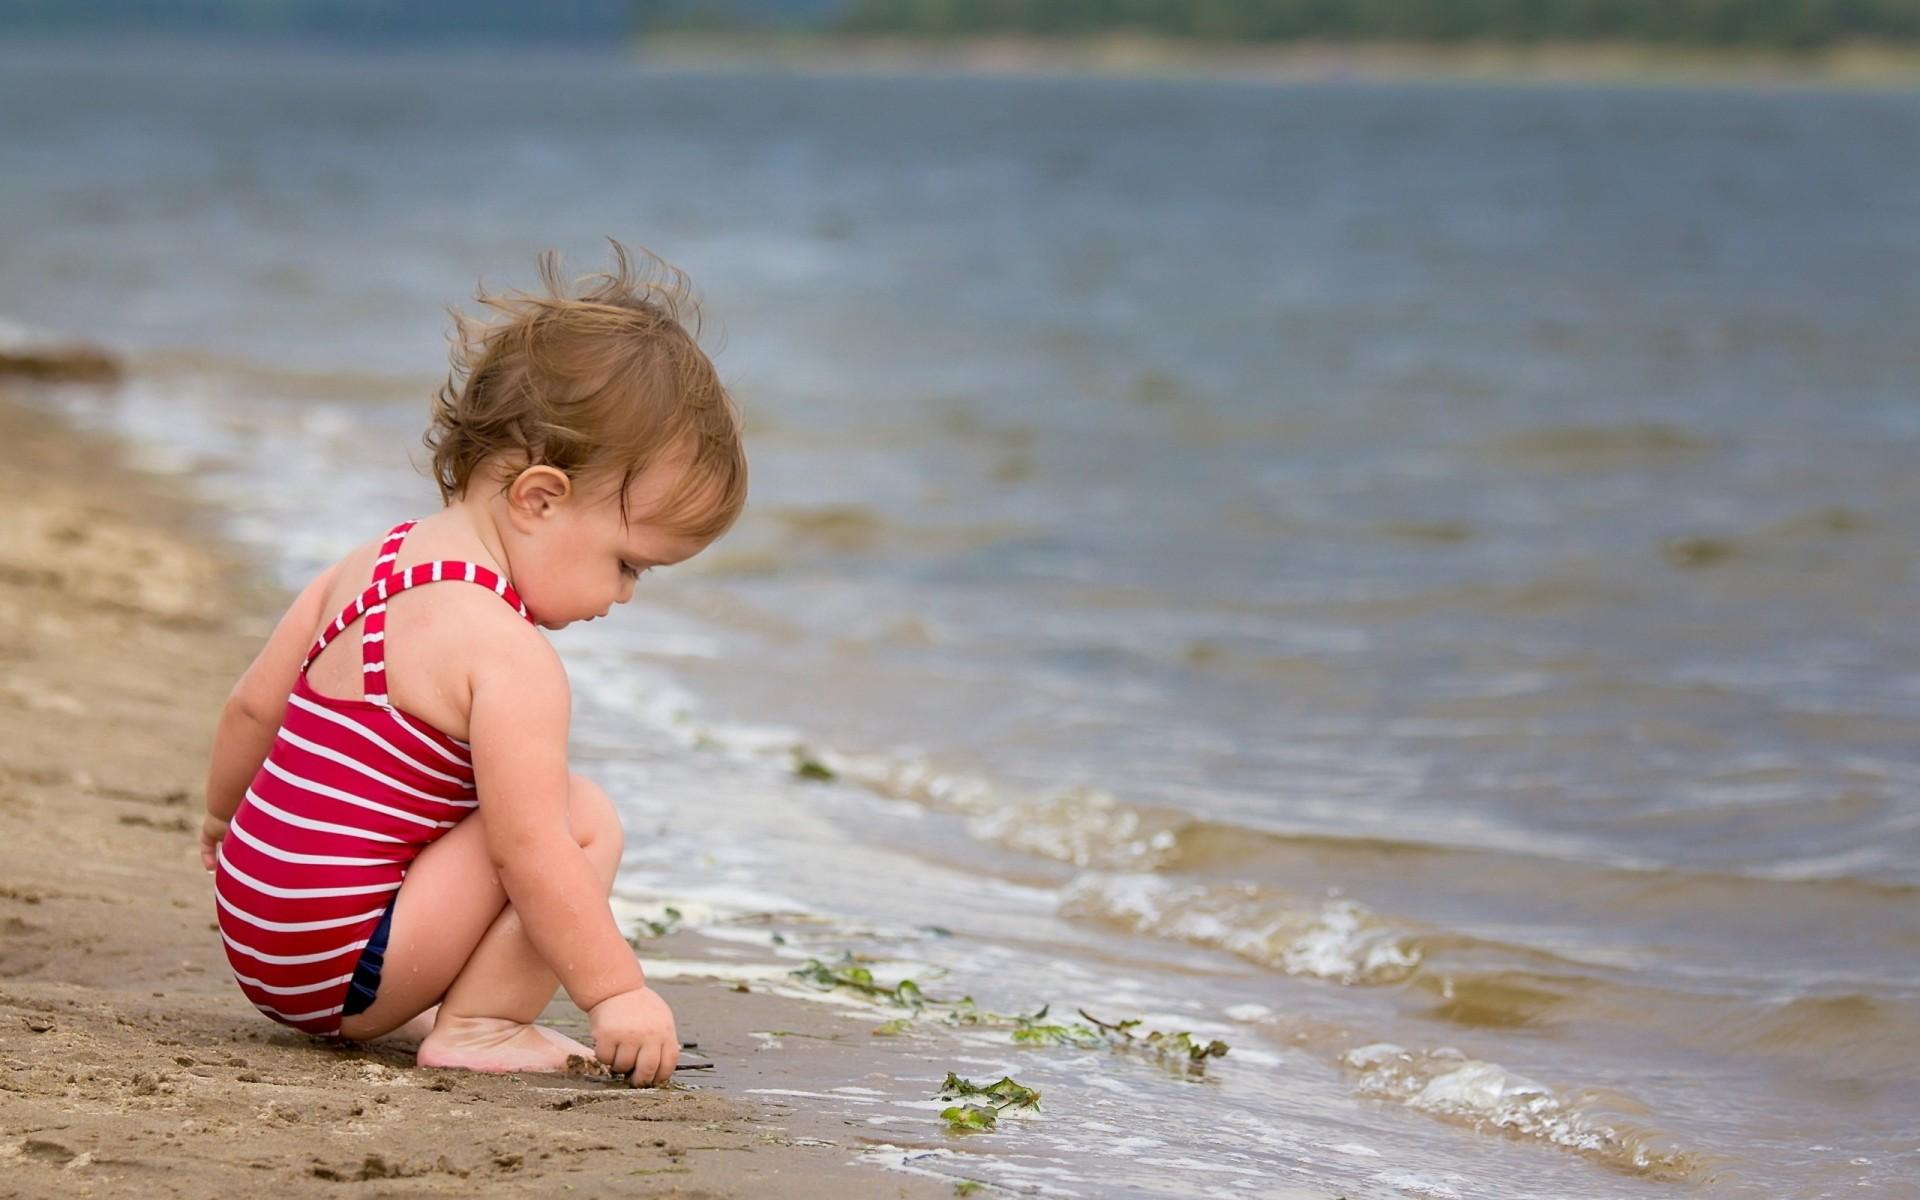 картинки берег моря малыши ведет большому будде